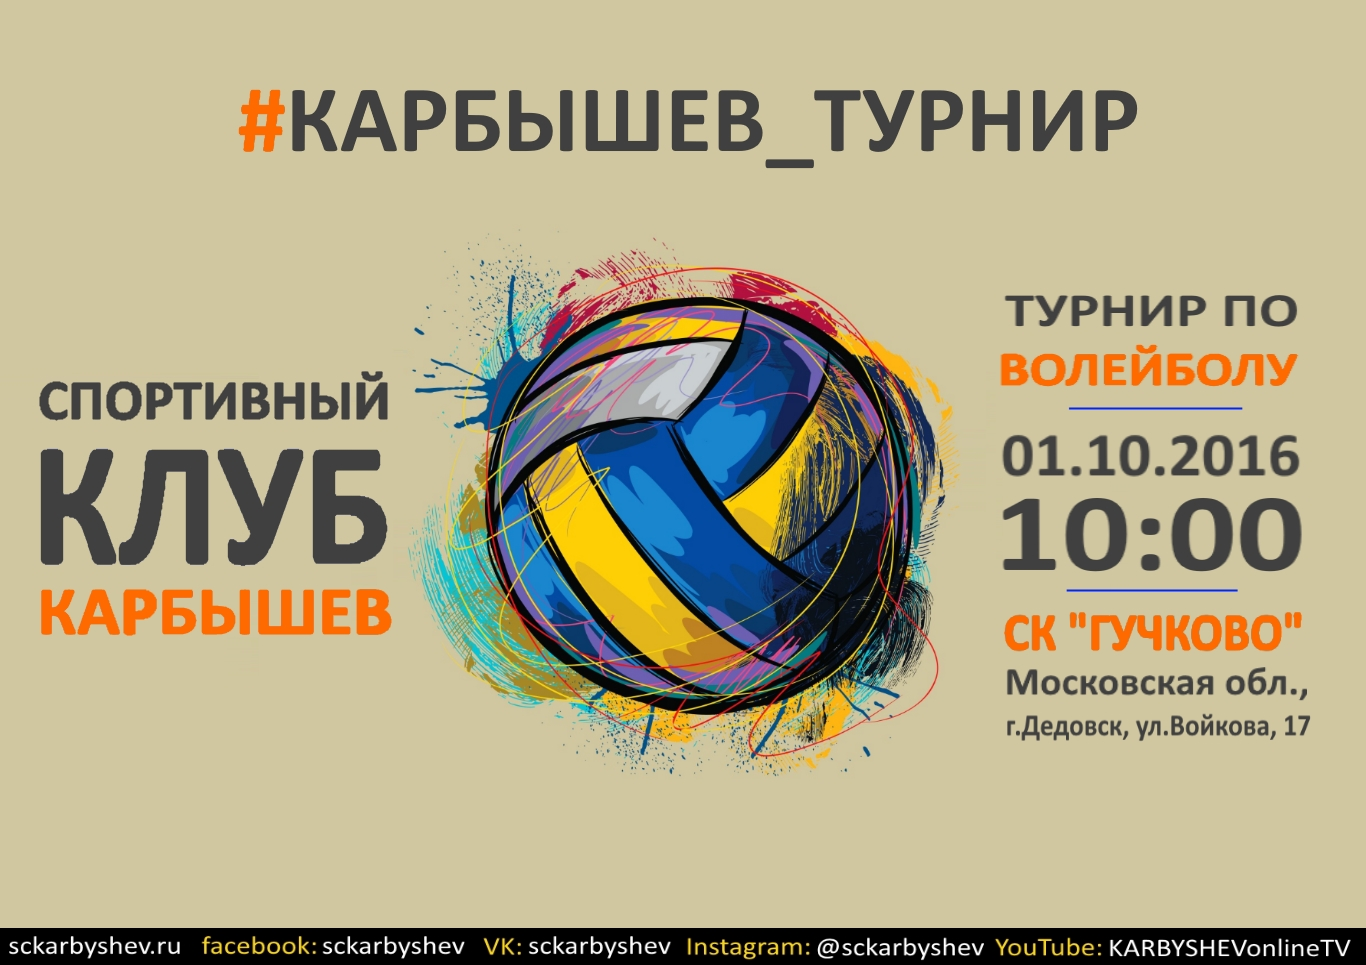 poster-volejbol